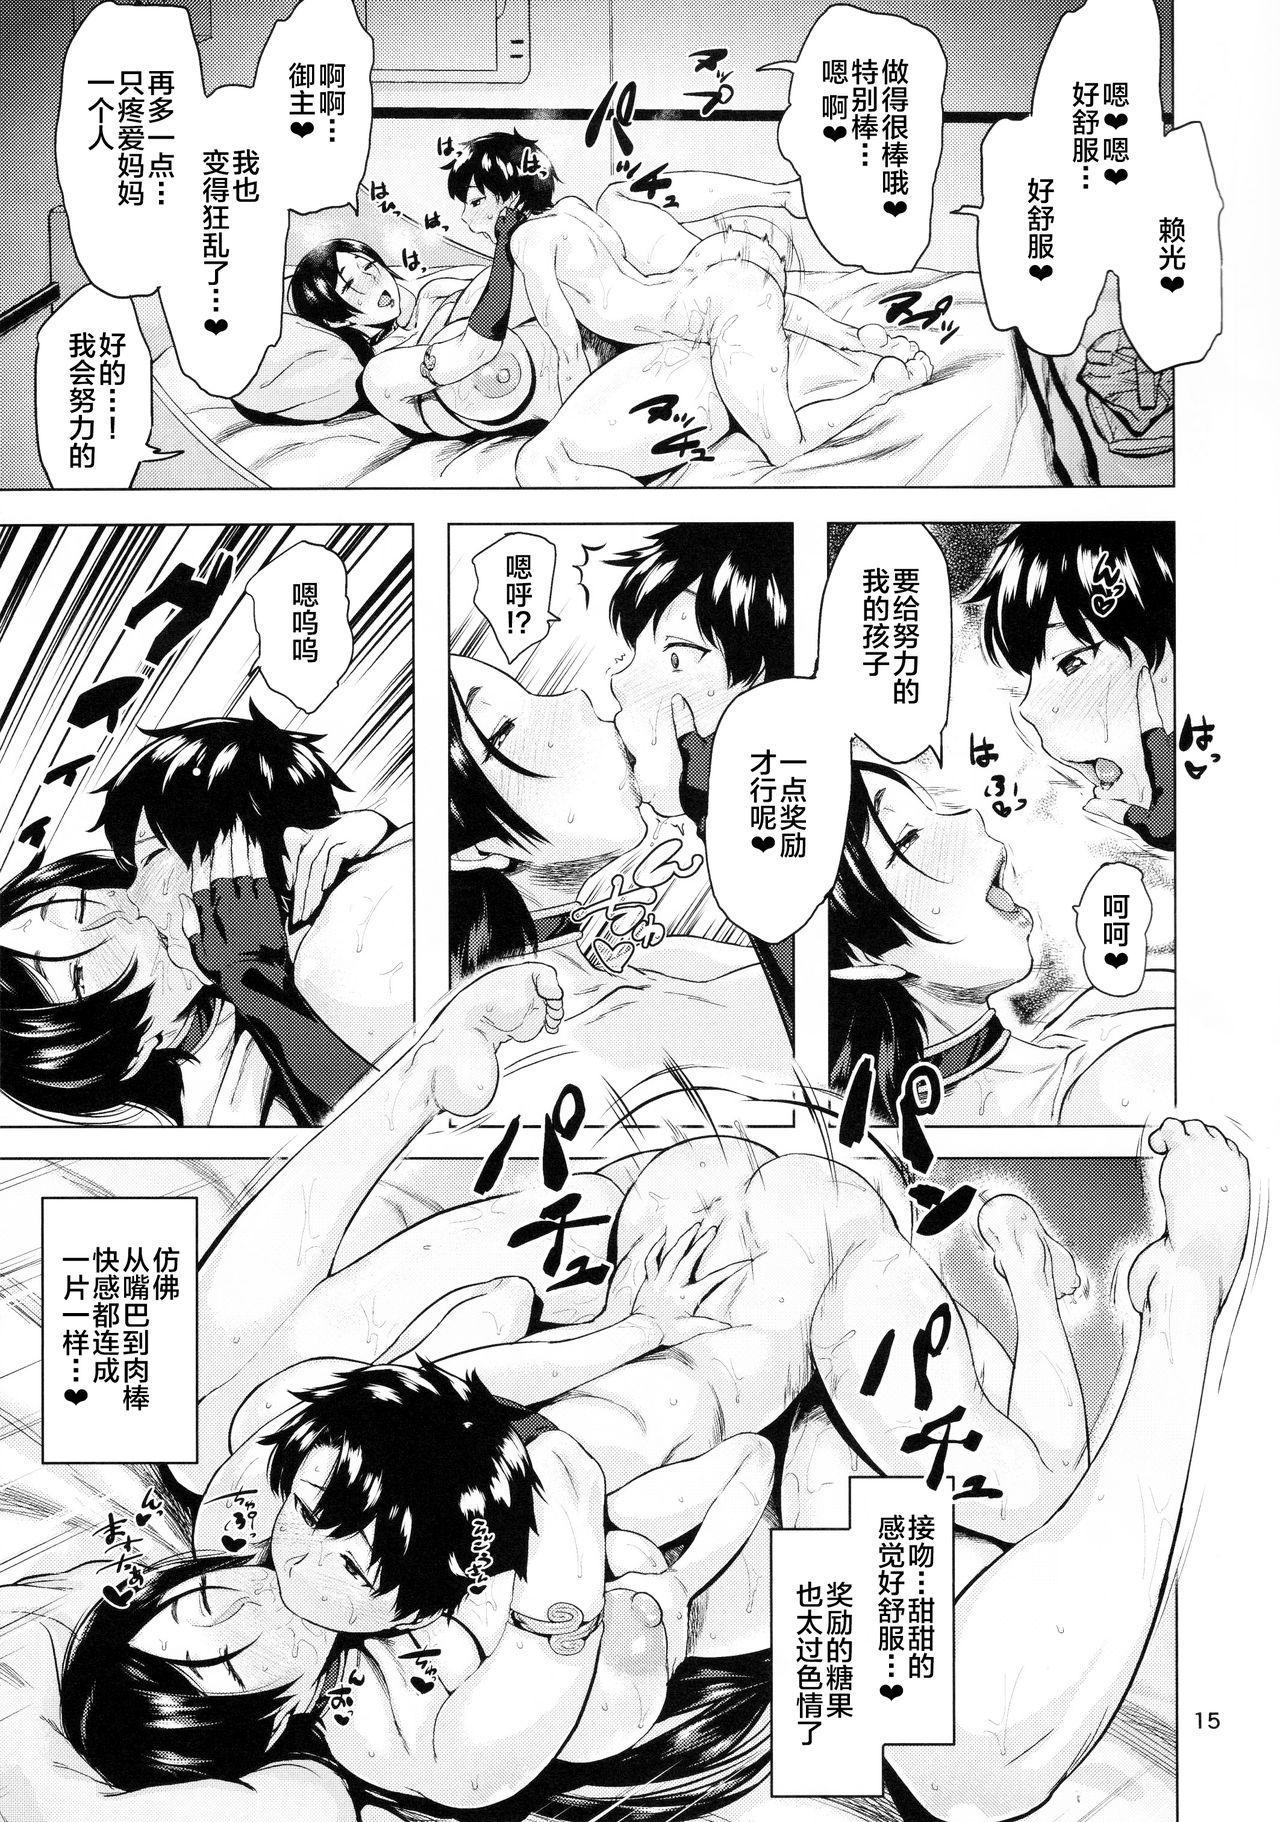 Natsu no Haha ni Goyoujin 16